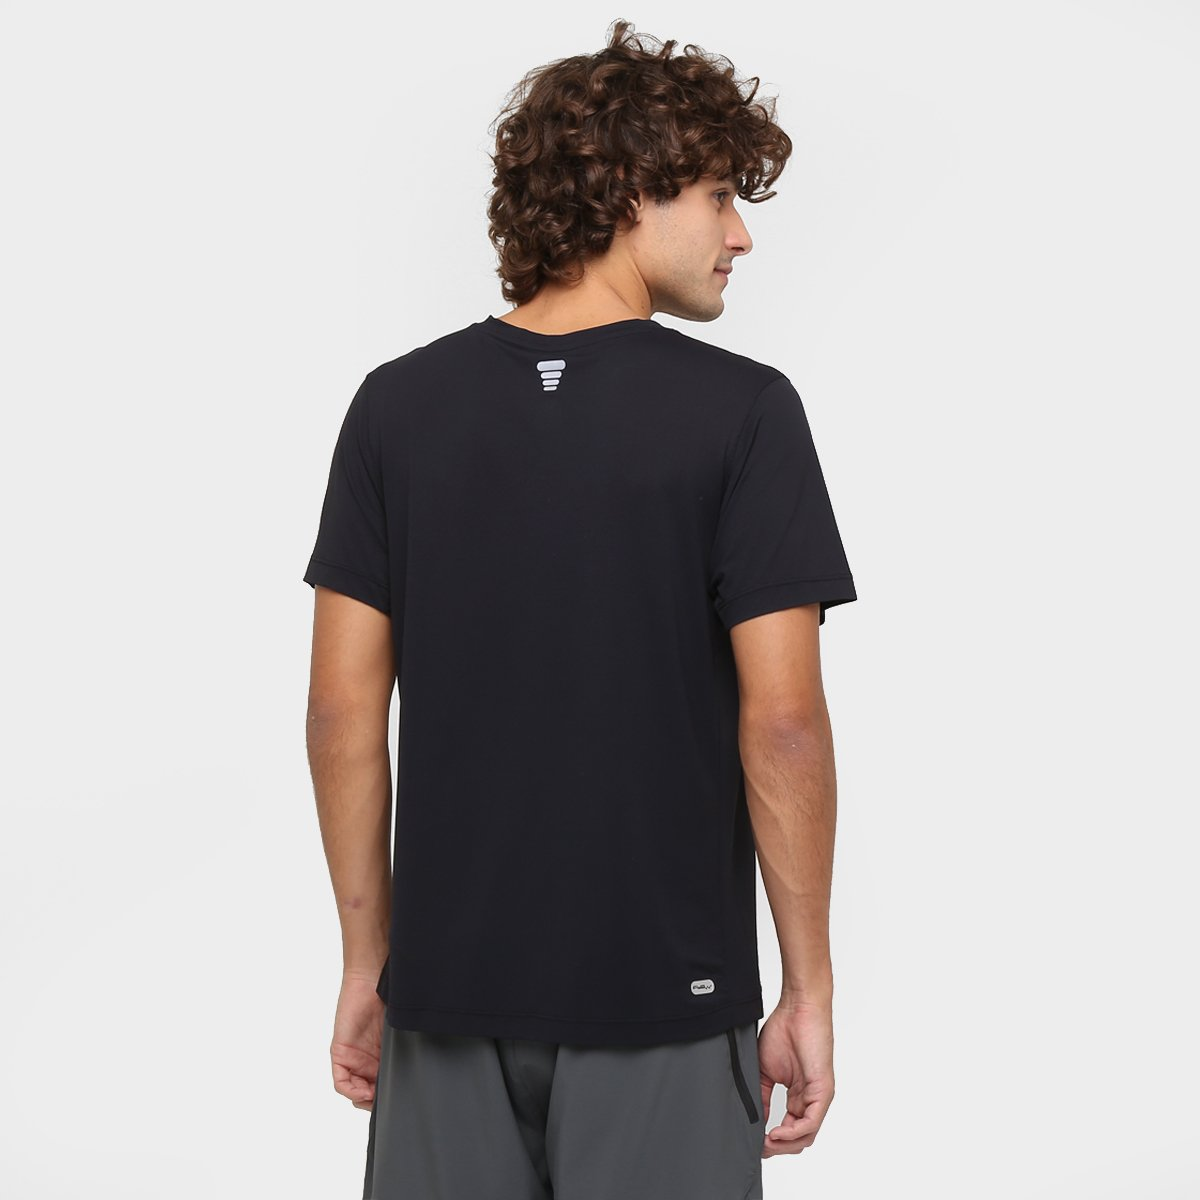 b9161c0701 Camiseta Fila Basic Light  Camiseta Fila Basic Light ...